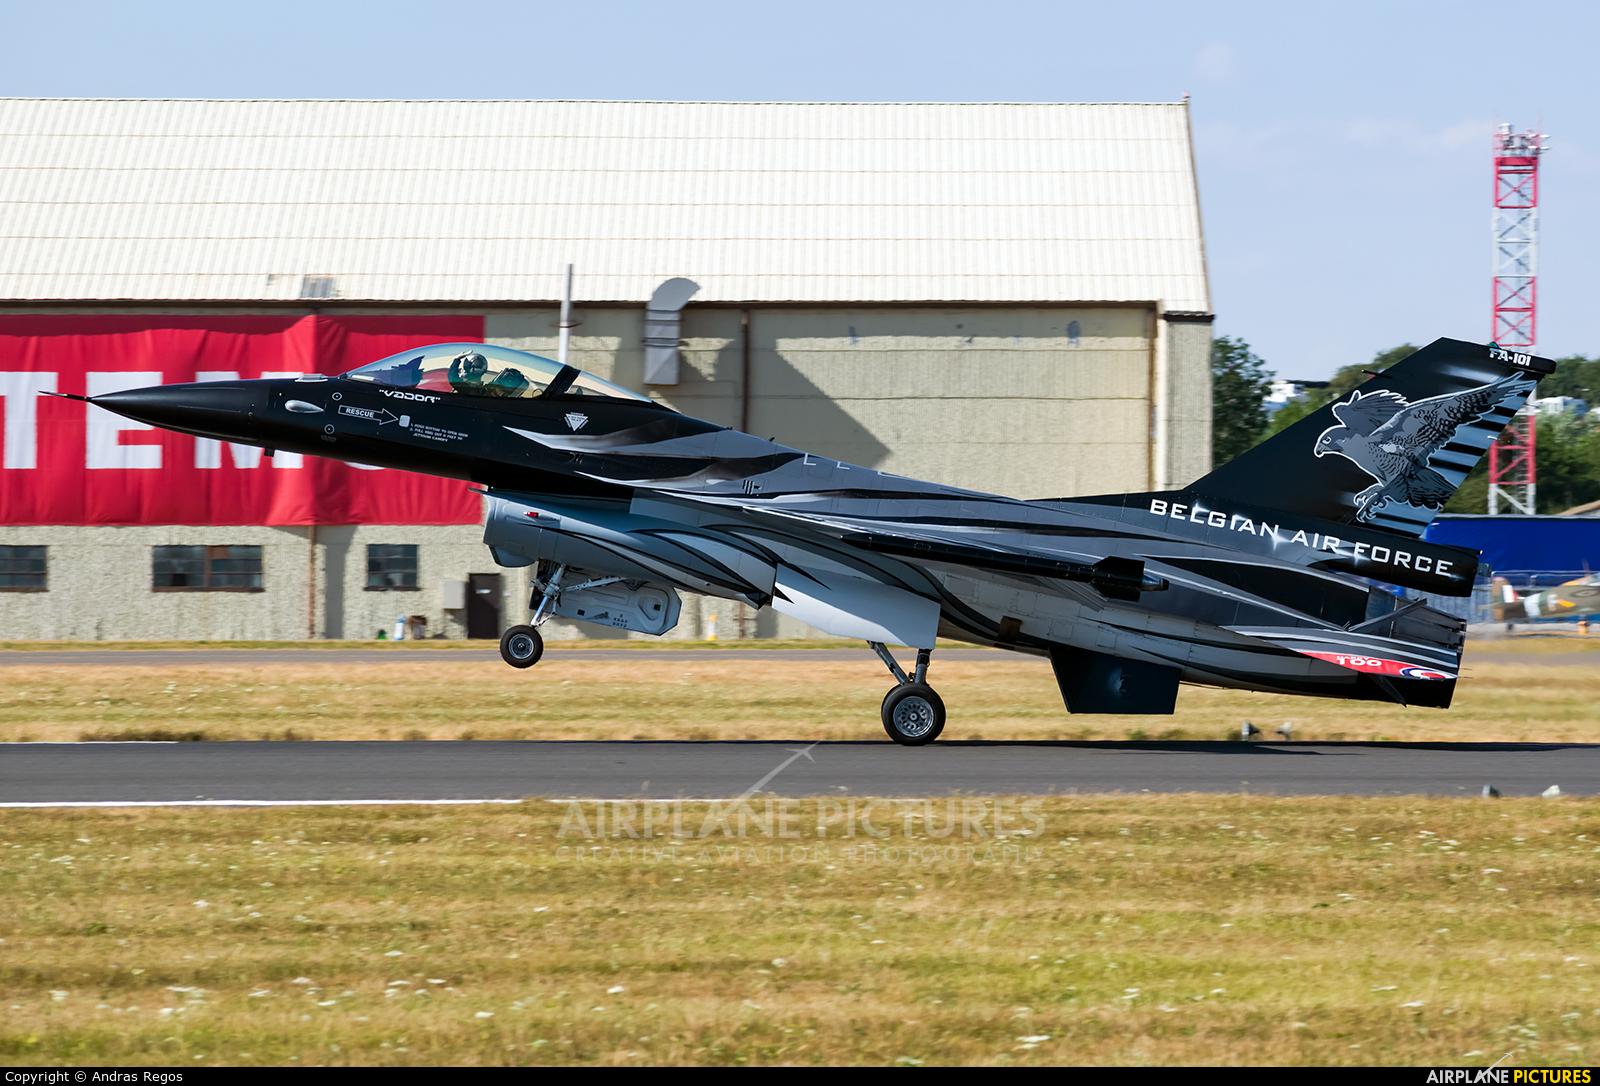 Belgium - Air Force FA-101 aircraft at Fairford